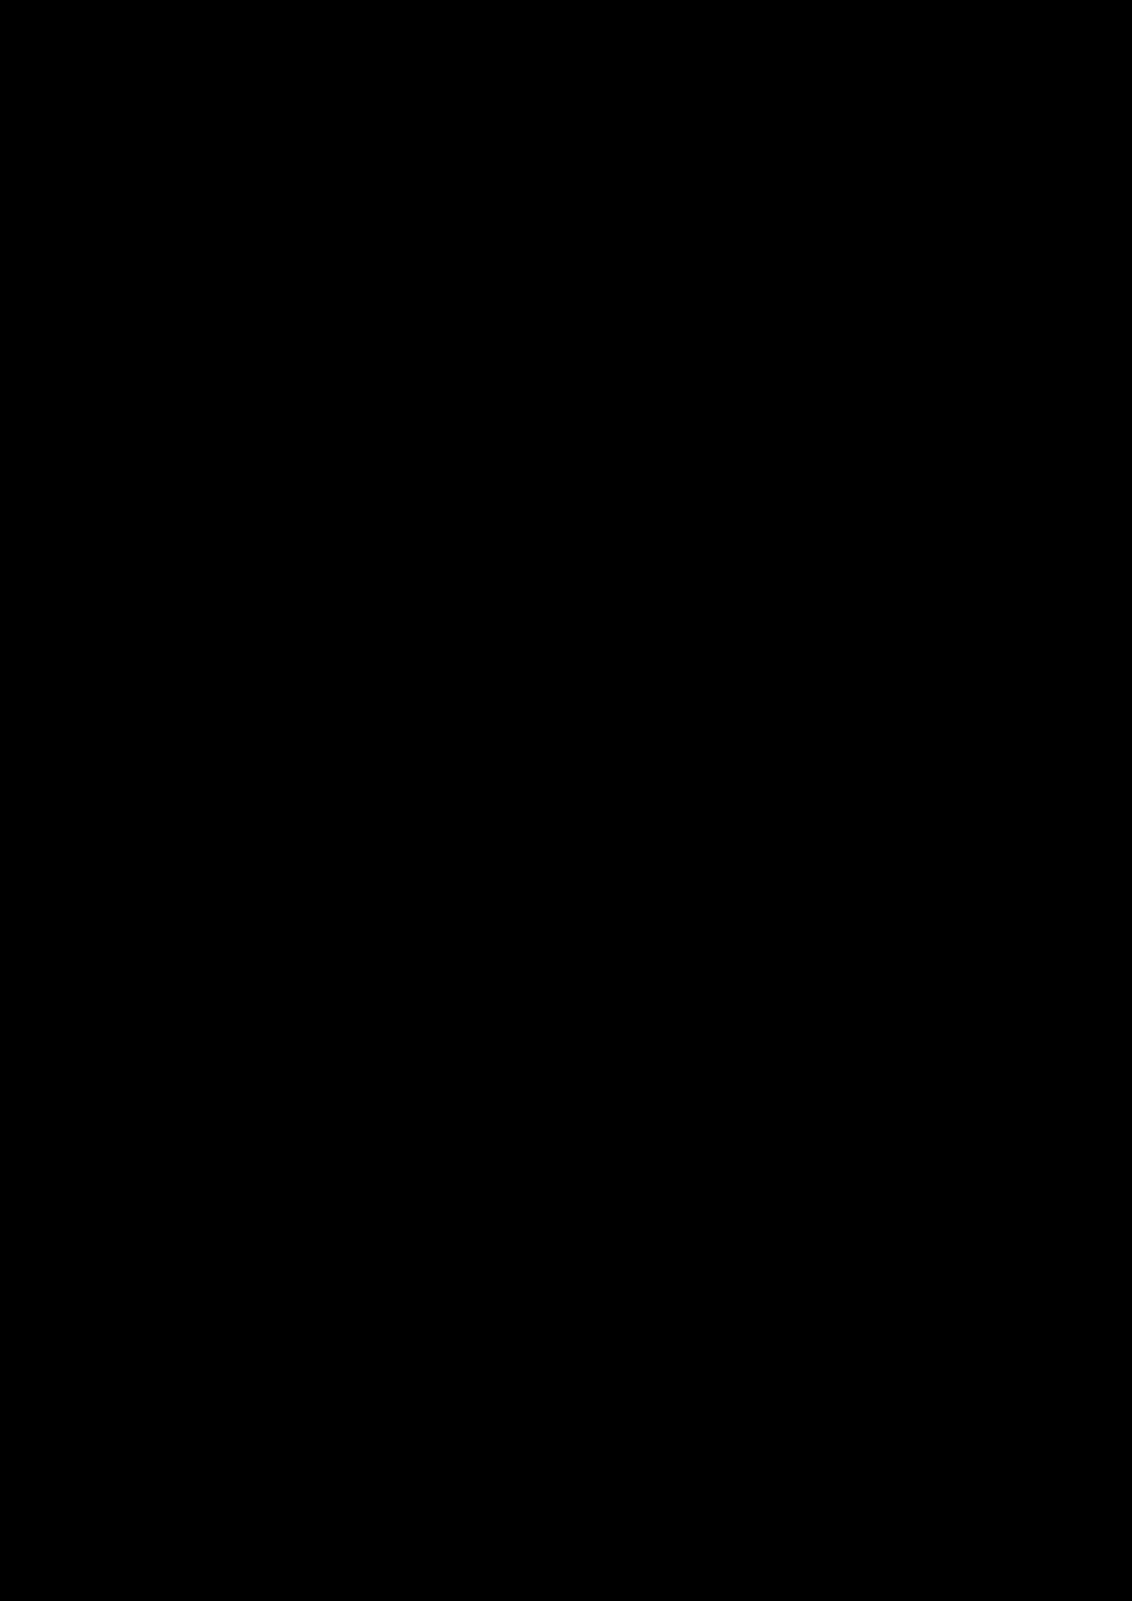 N.A.S.T.YA slide, Image 63